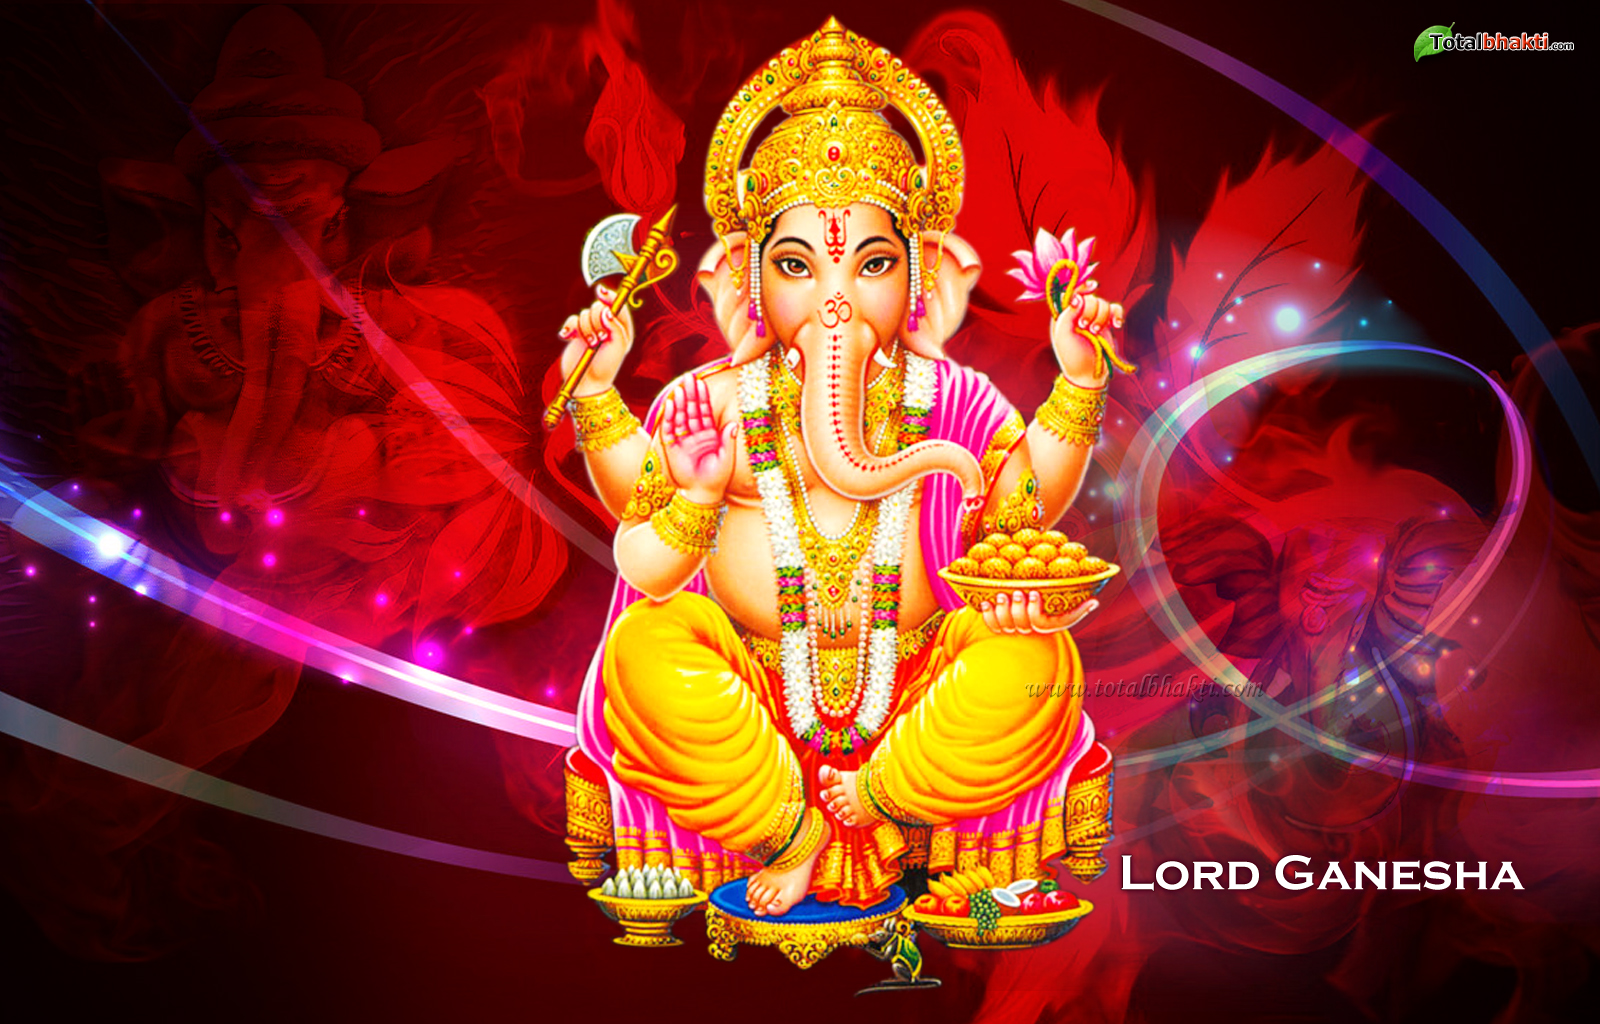 Lord Ganesh Ji Images With Bhaktibhaav 2019 God Wallpaper